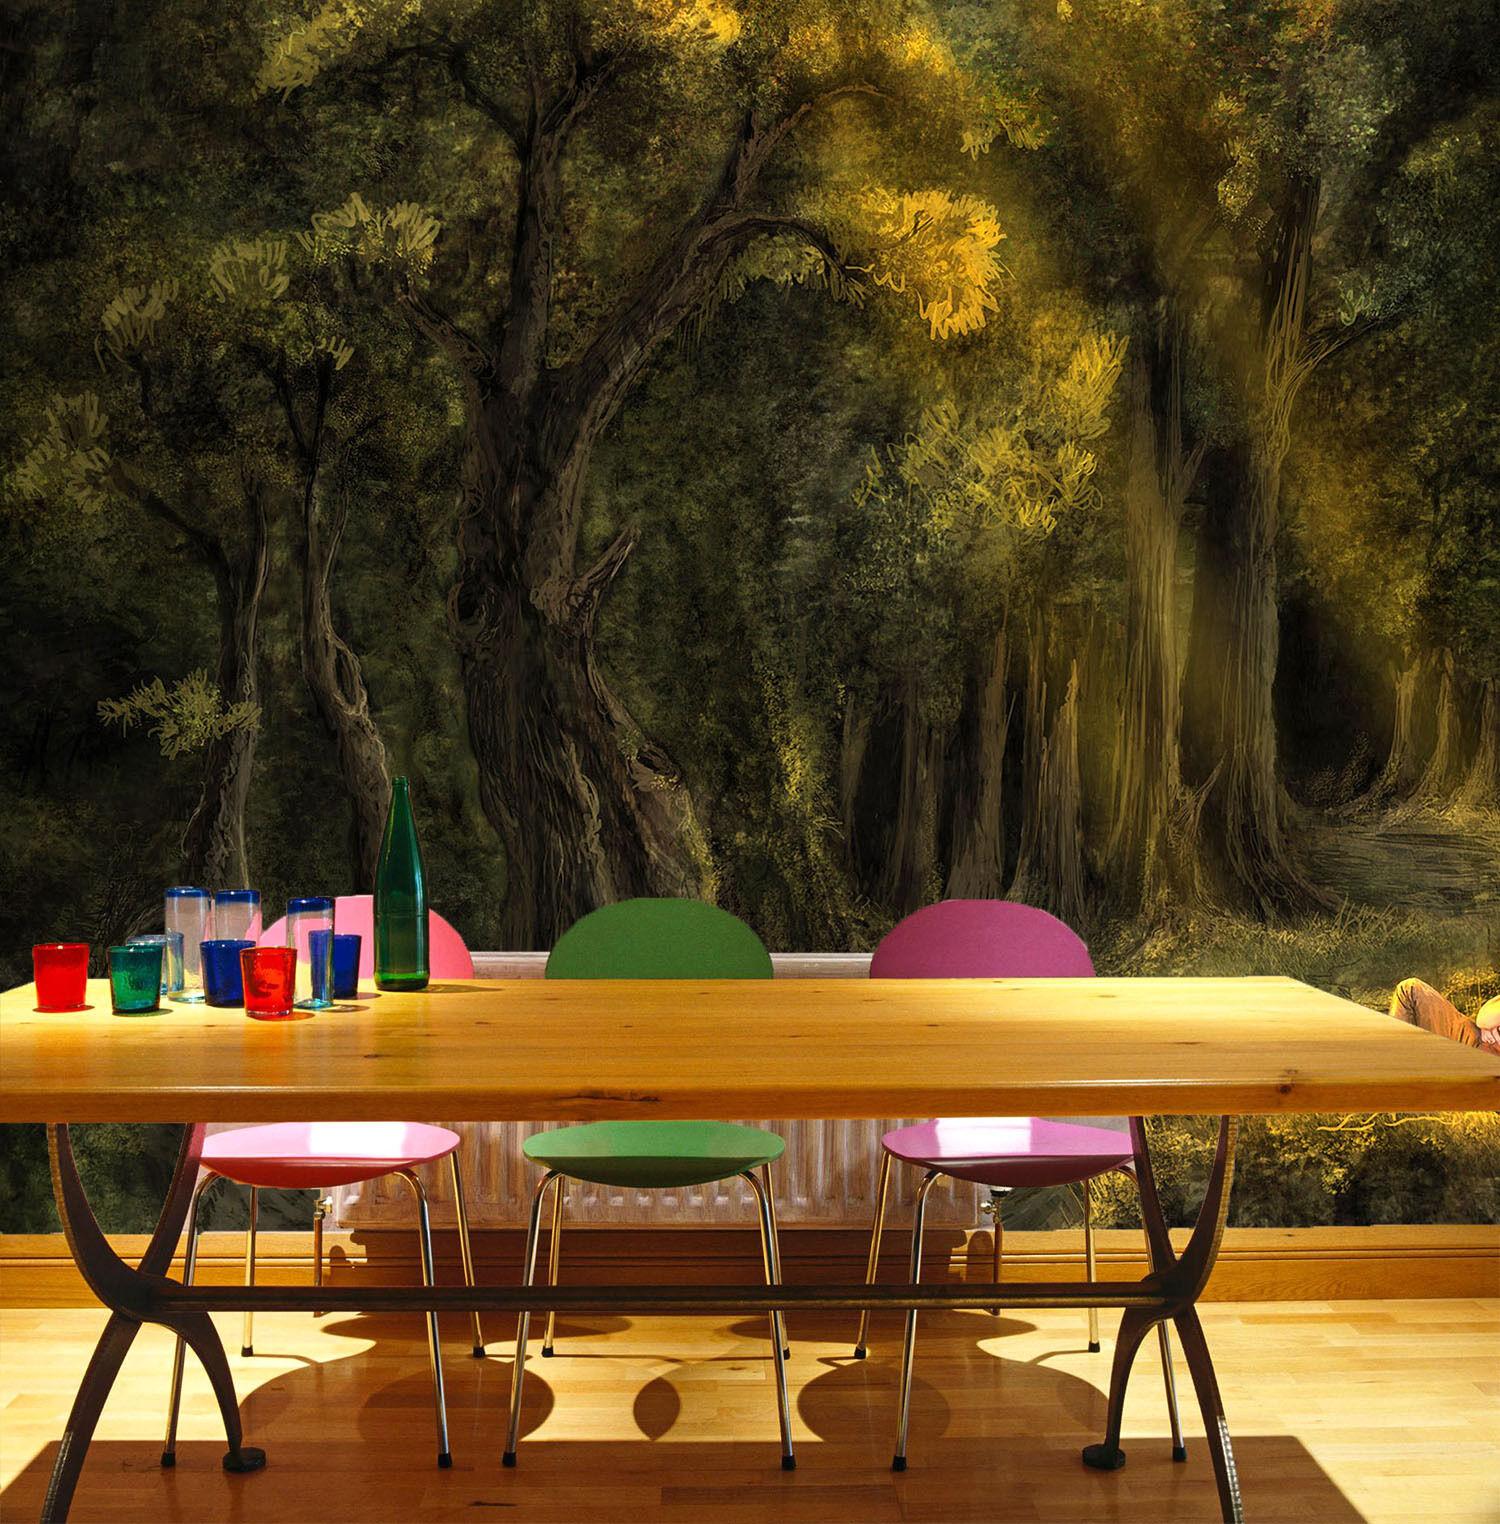 3D Schlafenden Mädchen, Wald Fototapeten Wandbild Fototapete BildTapete Familie